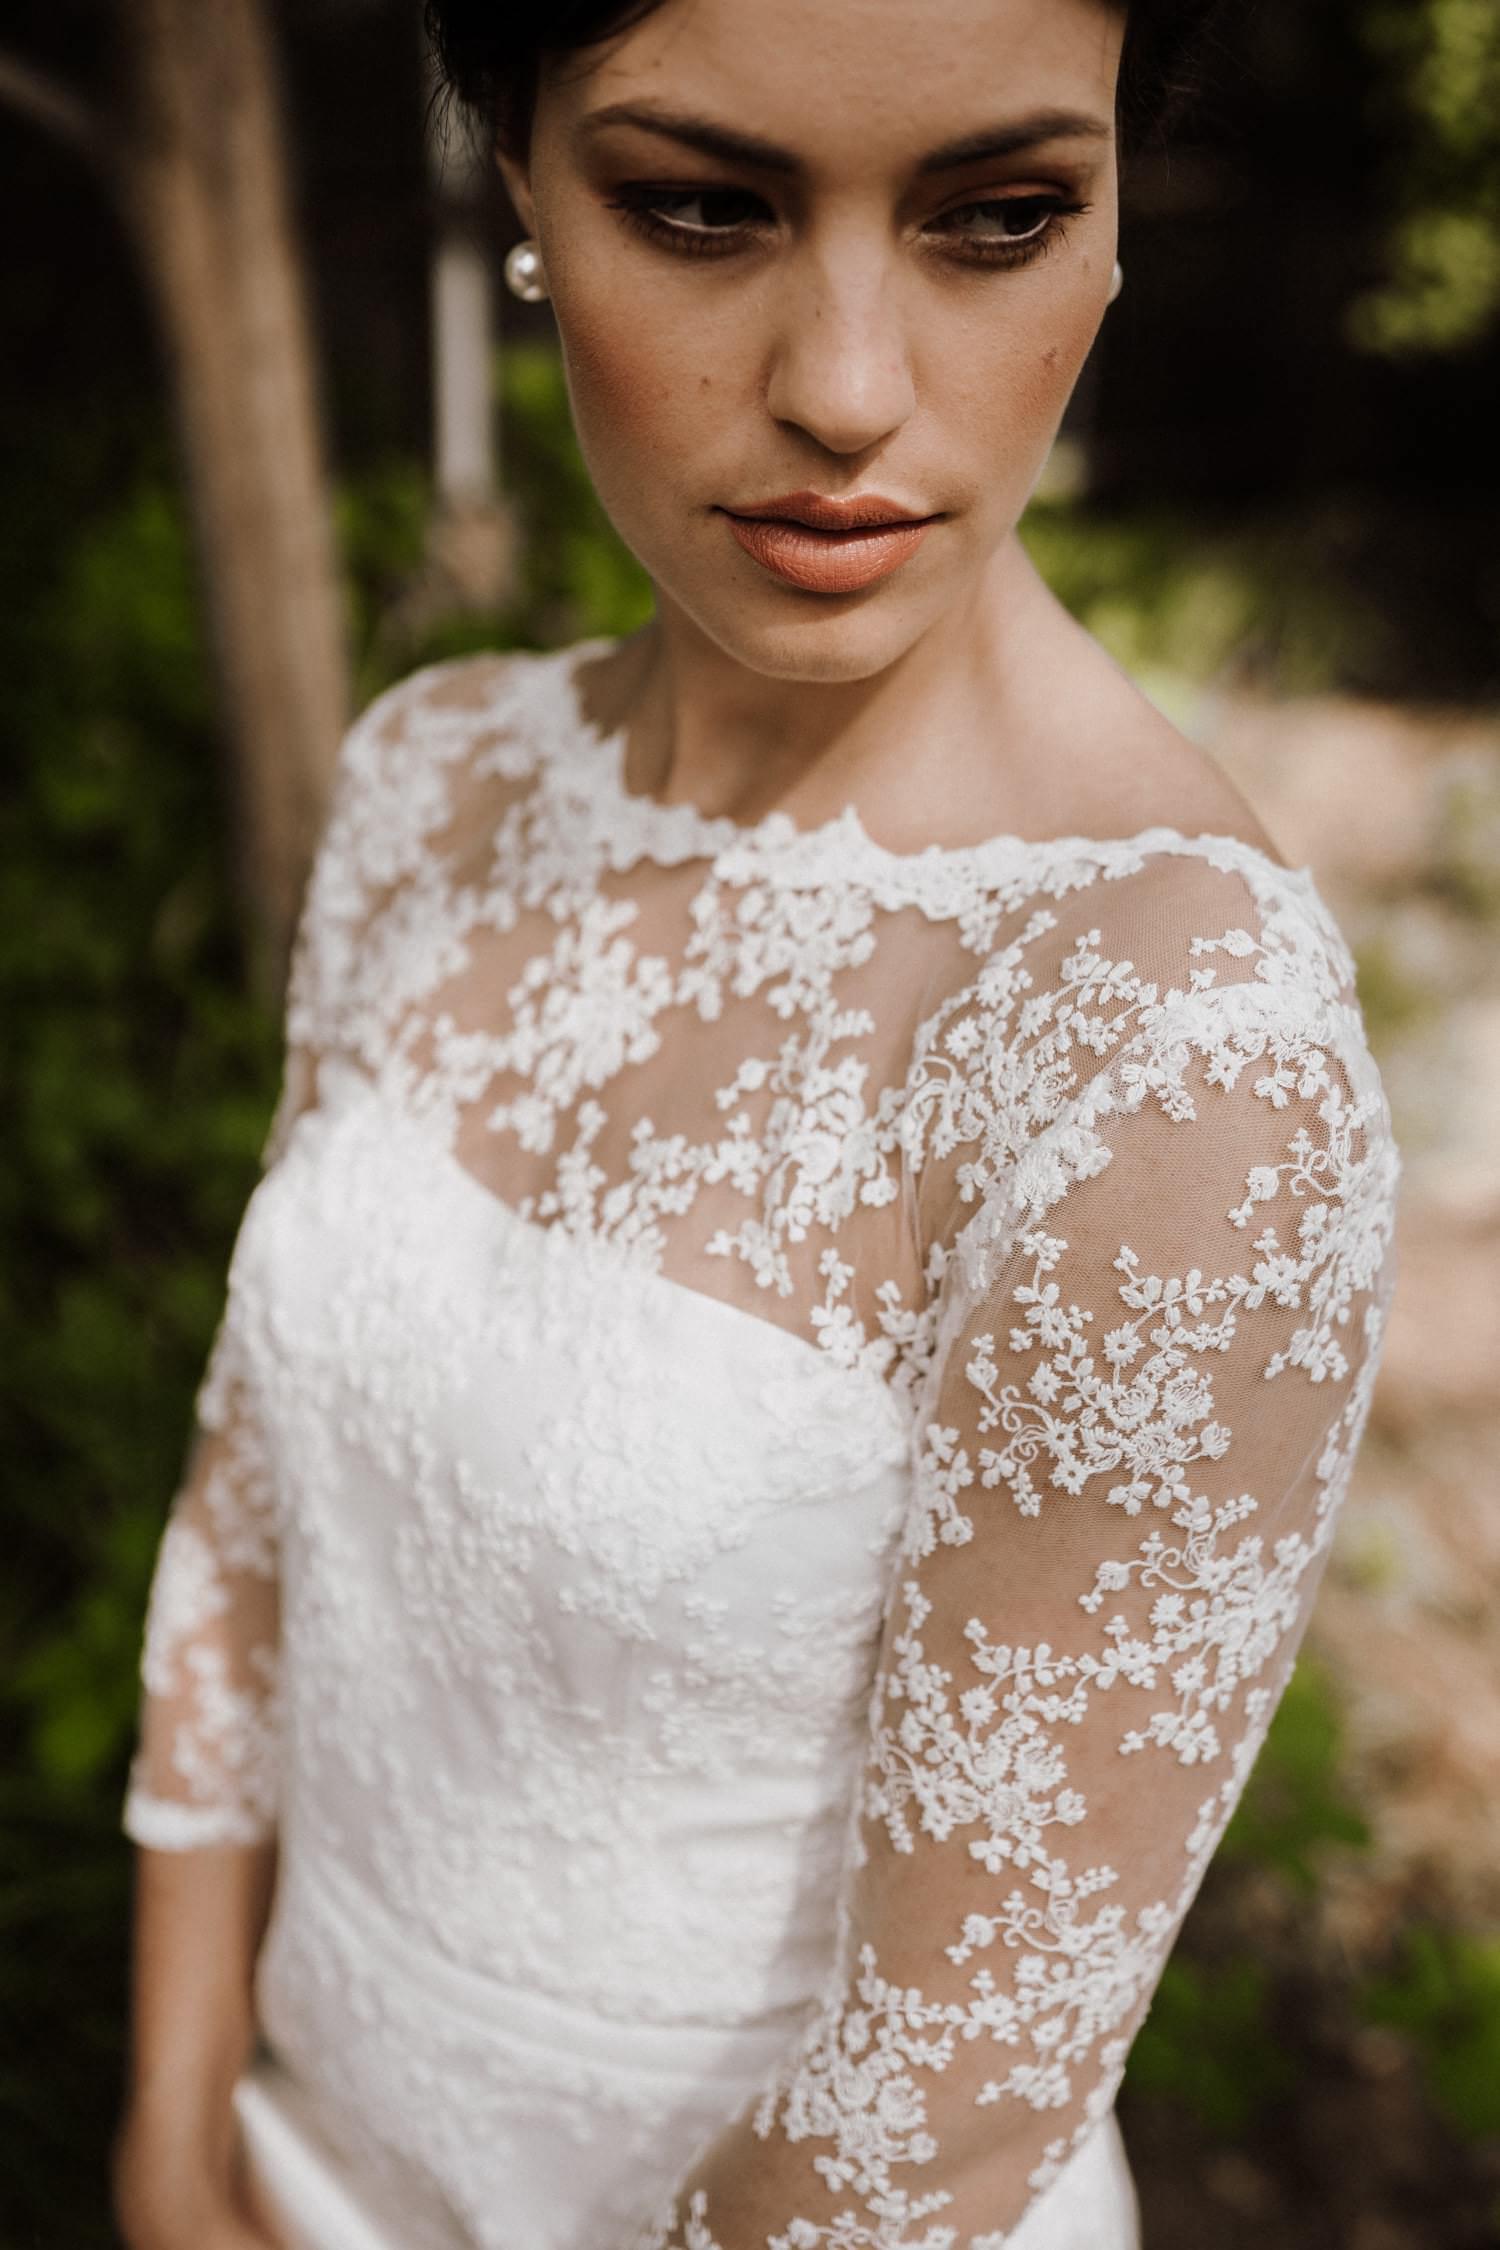 Theresa Hochzeitskleid Kurz Vintage Mit Spitze Claudia Heller